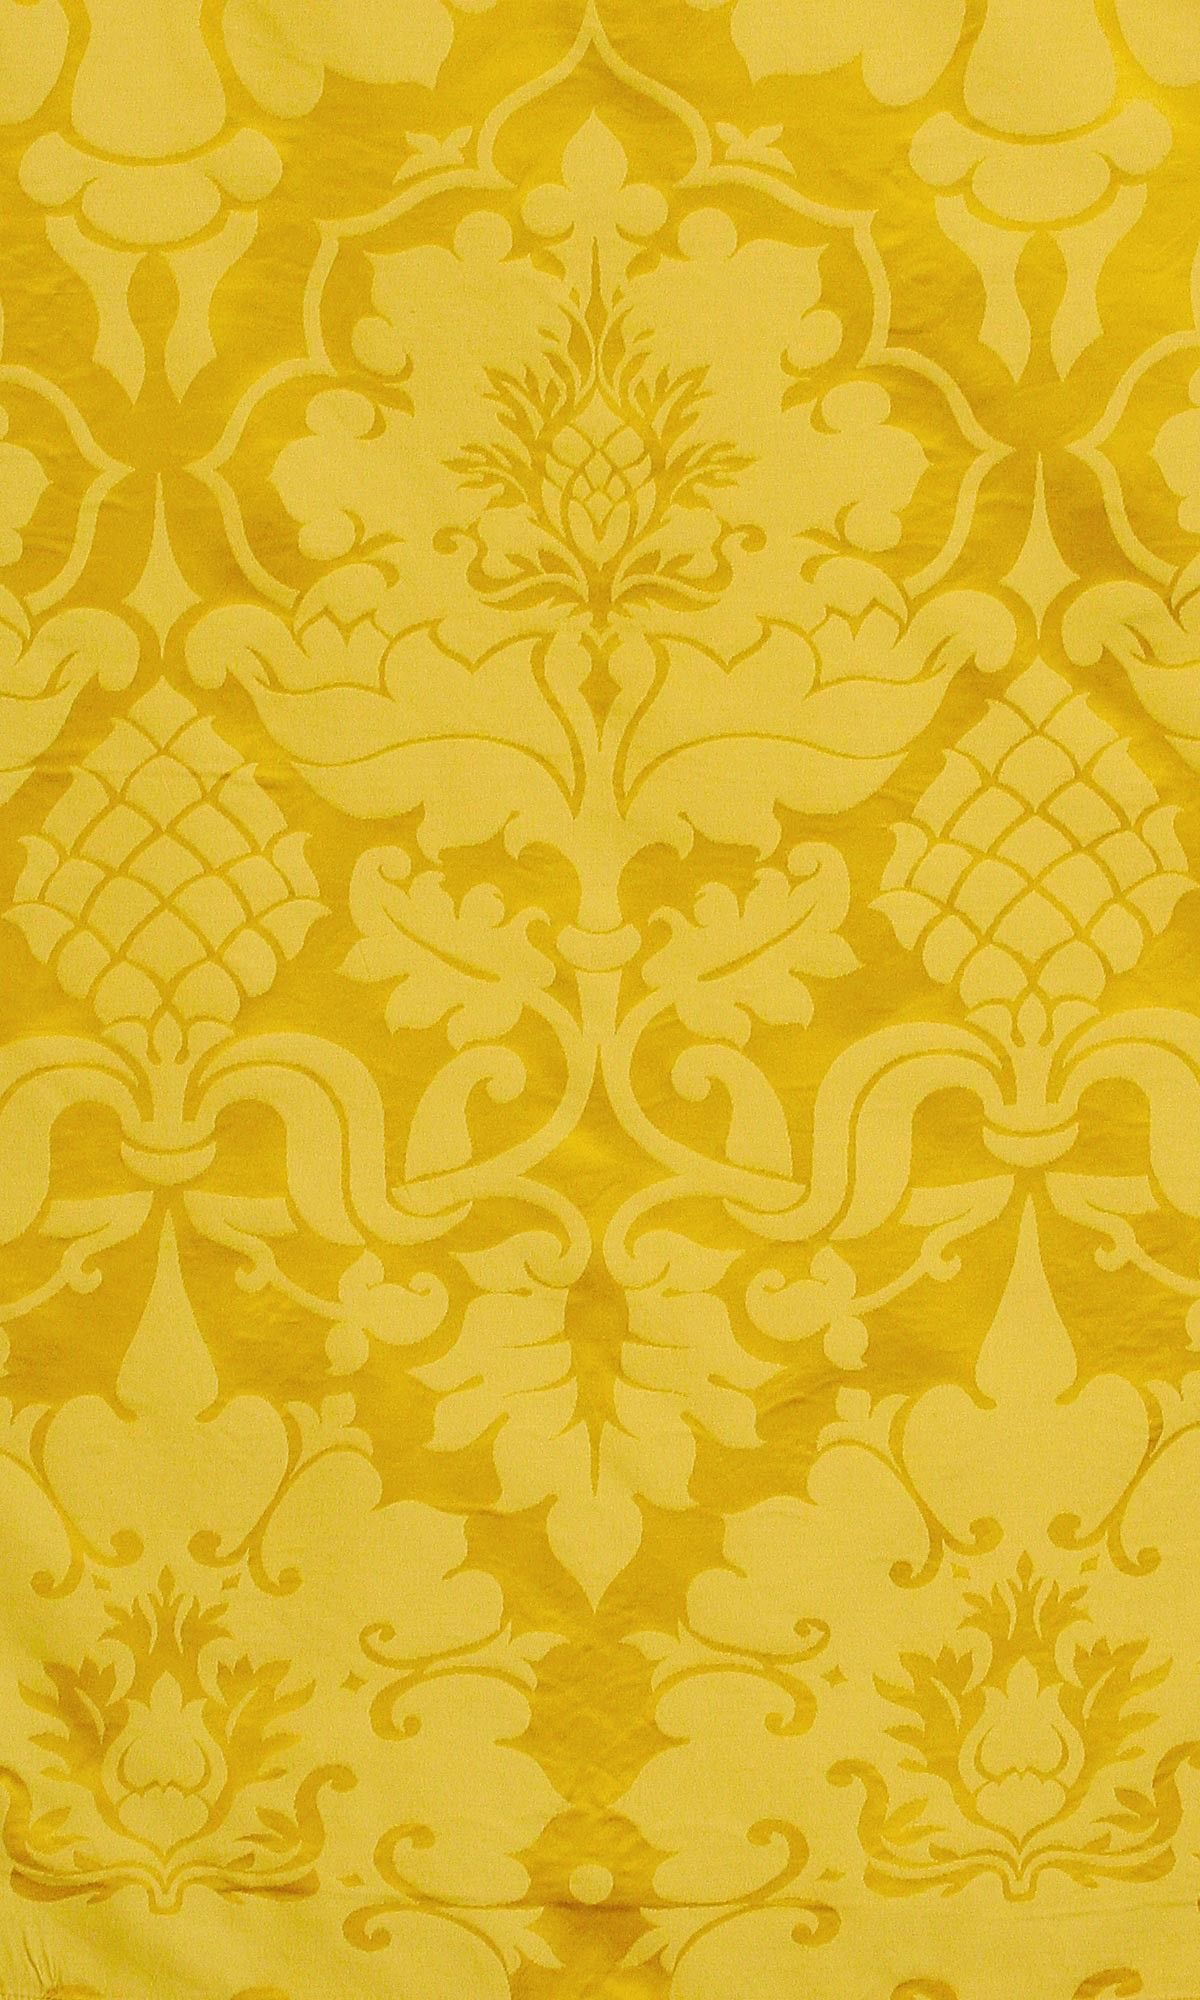 Bellini Imperial Yellow Damask Yellow wallpaper, Mustard